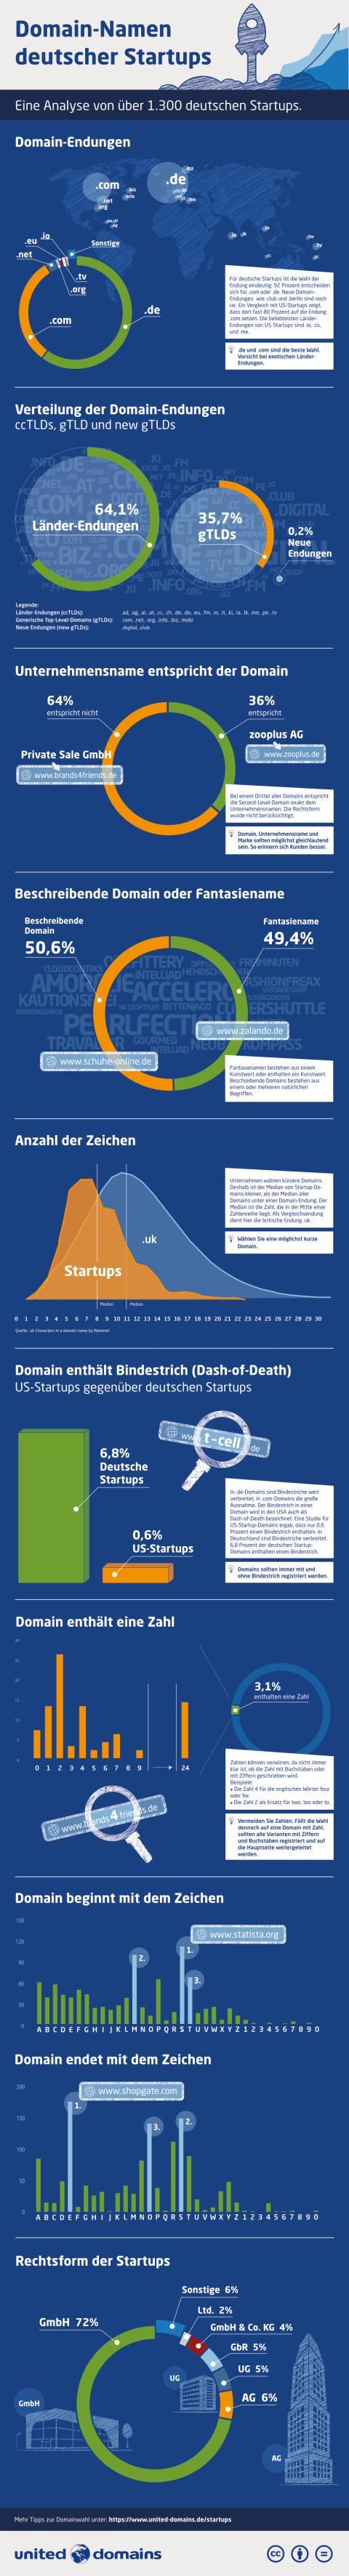 Infografik Startup-Studie